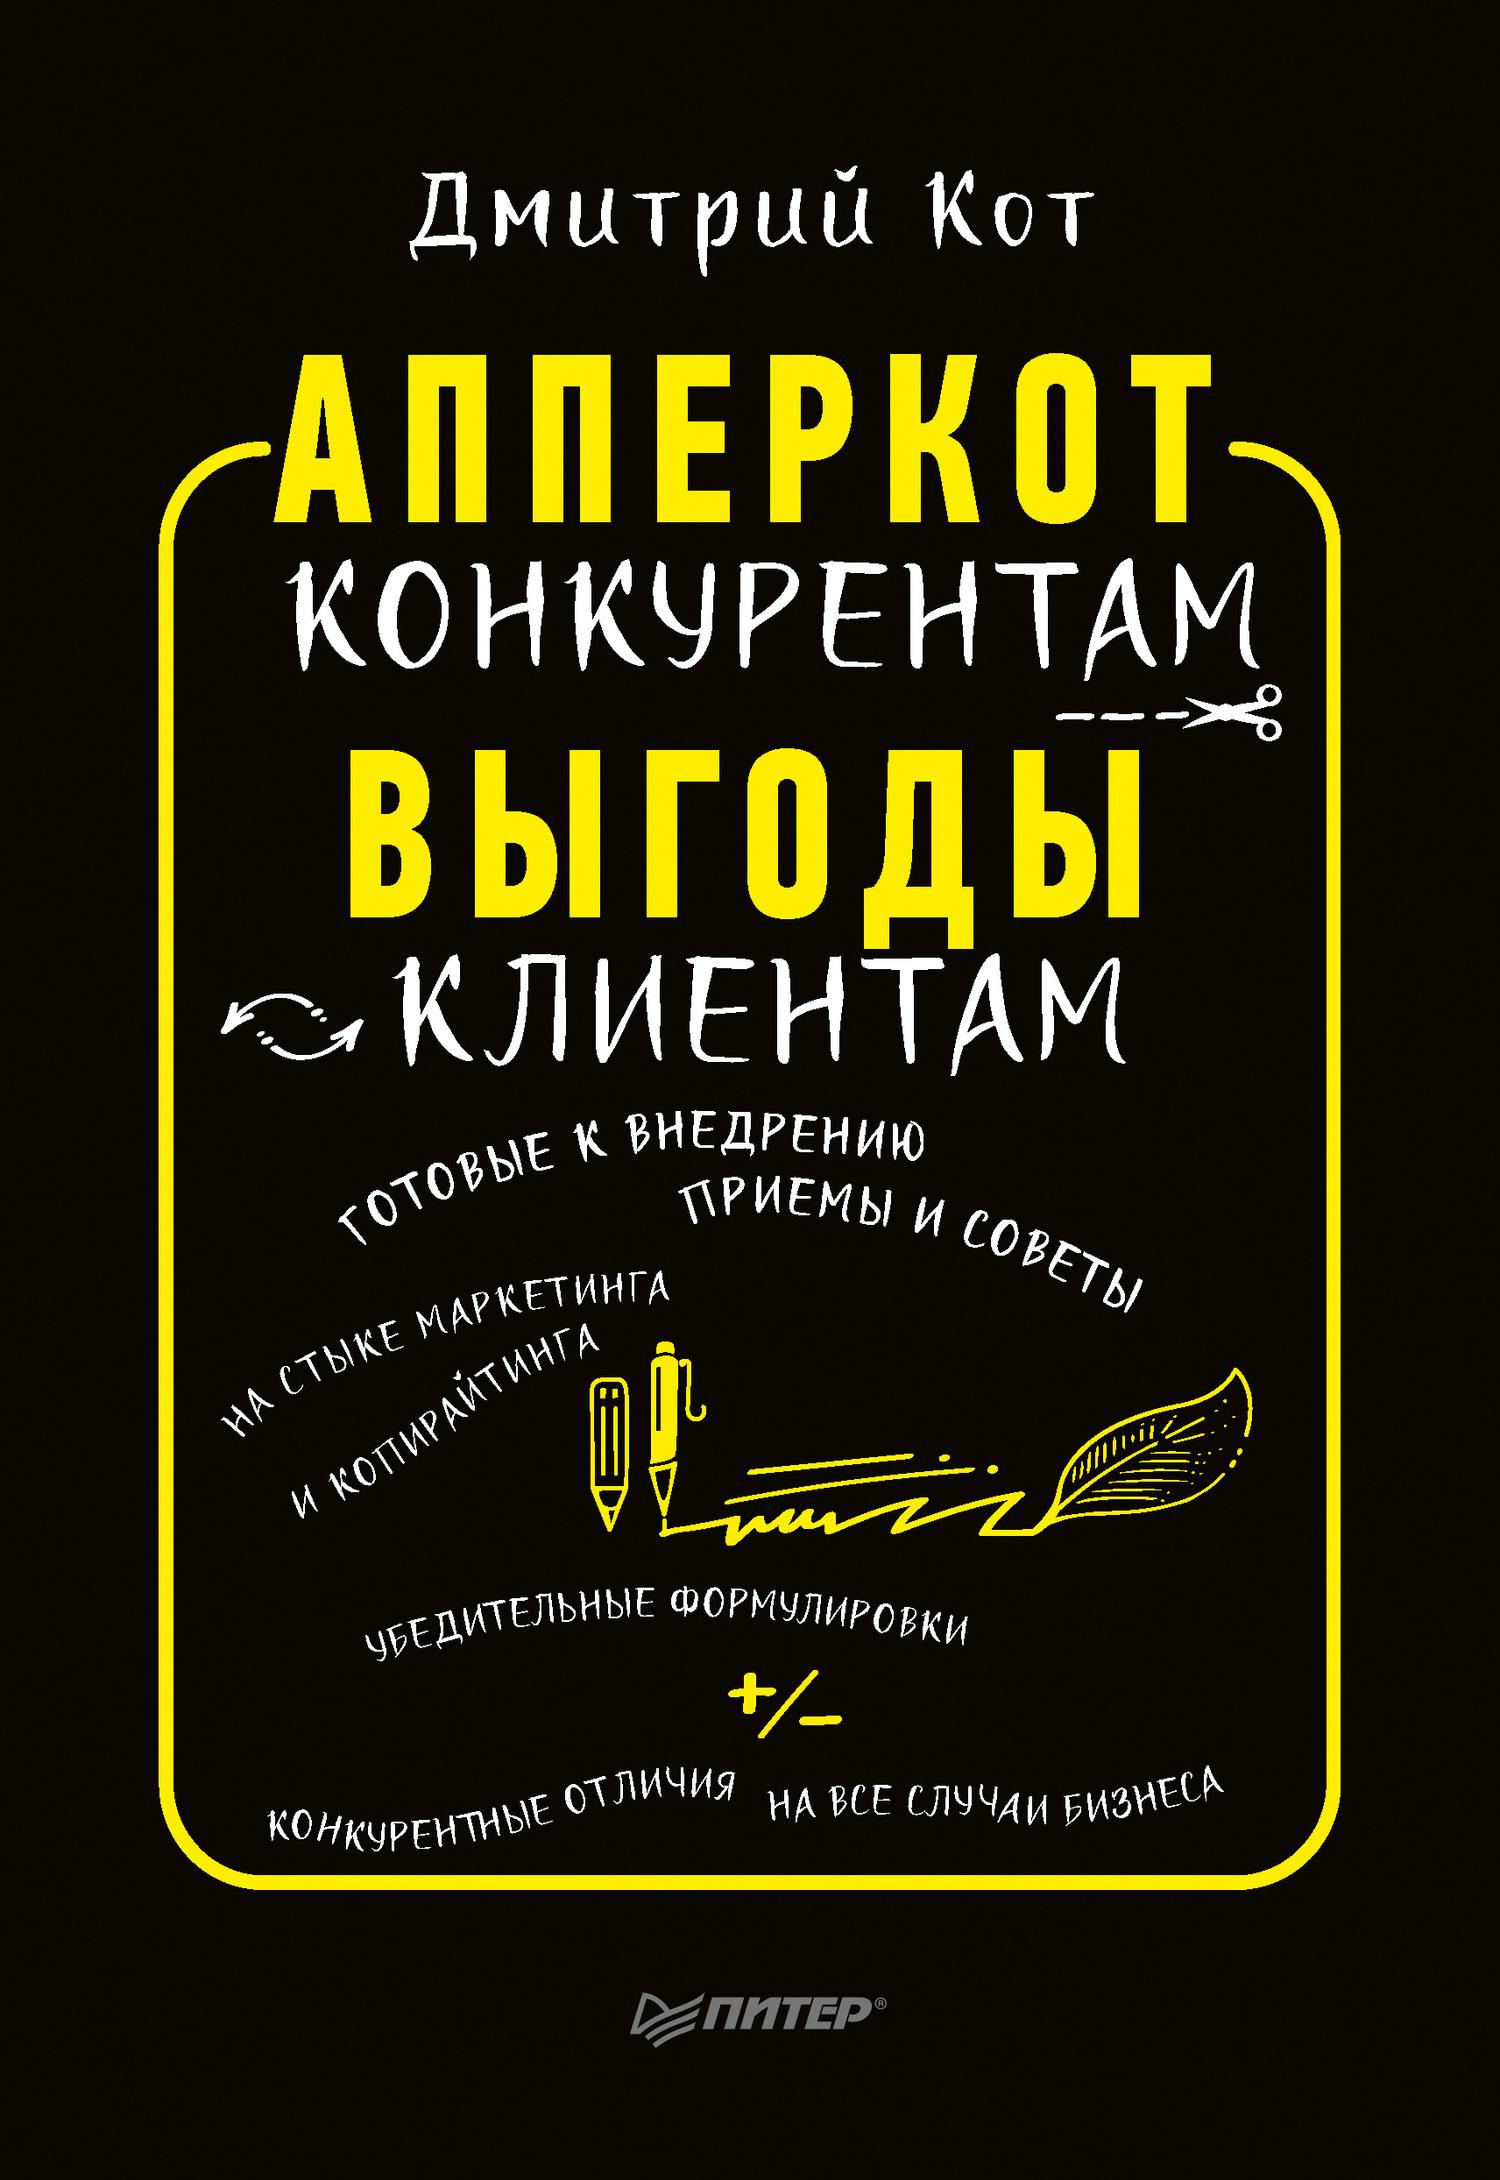 Обложка книги. Автор - Дмитрий Кот